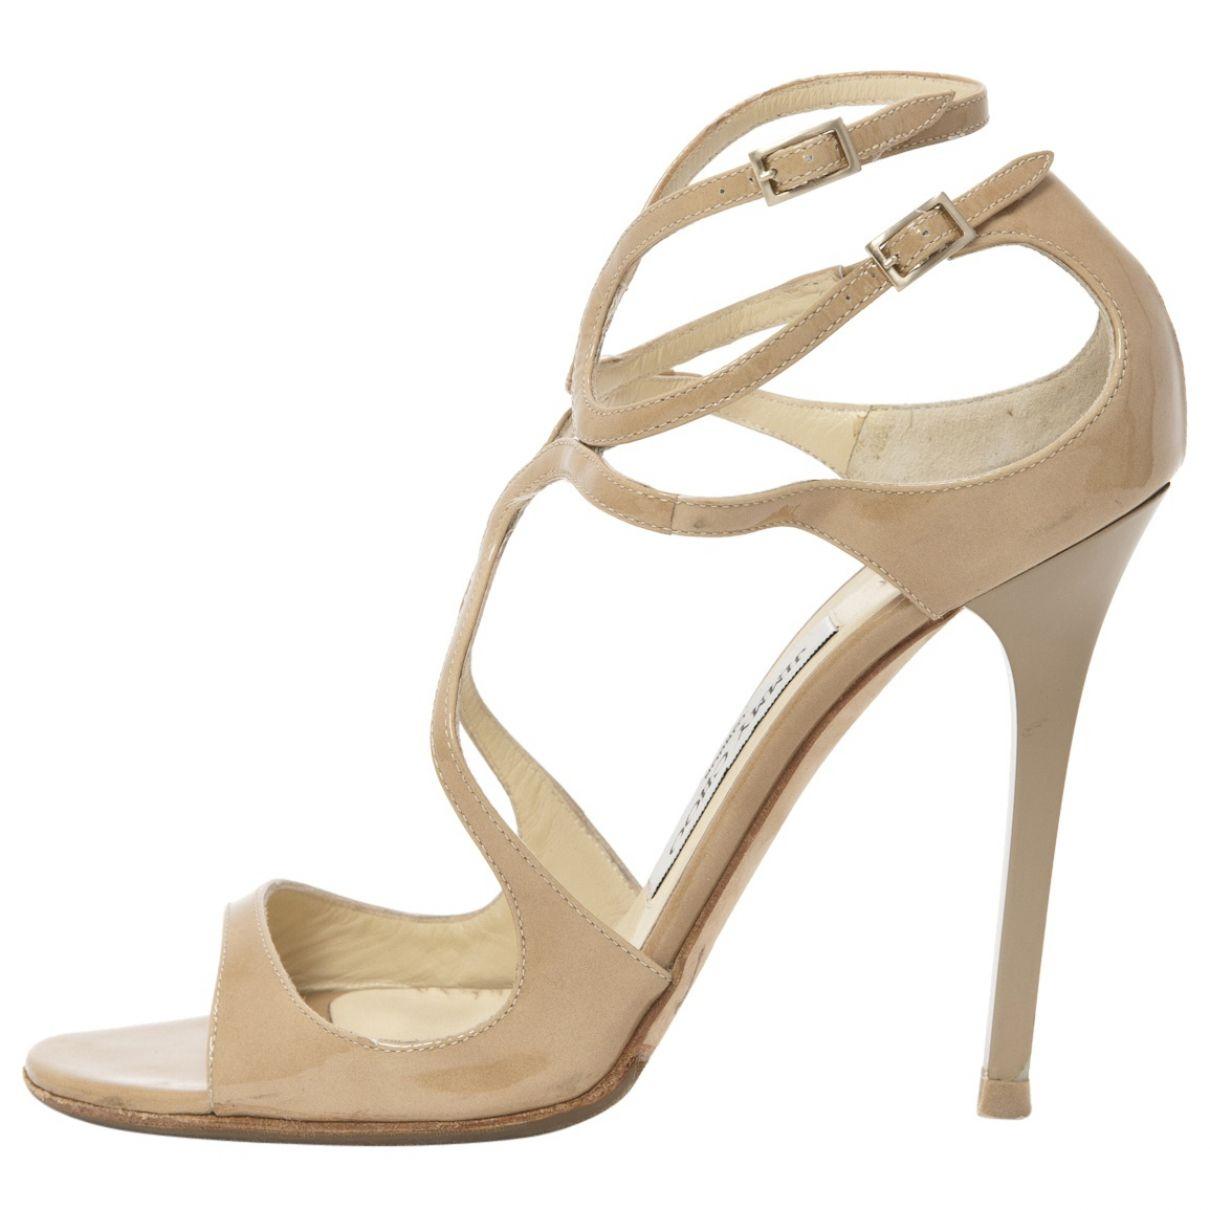 f42d71ed4 JIMMY CHOO Beige Patent leather Sandals